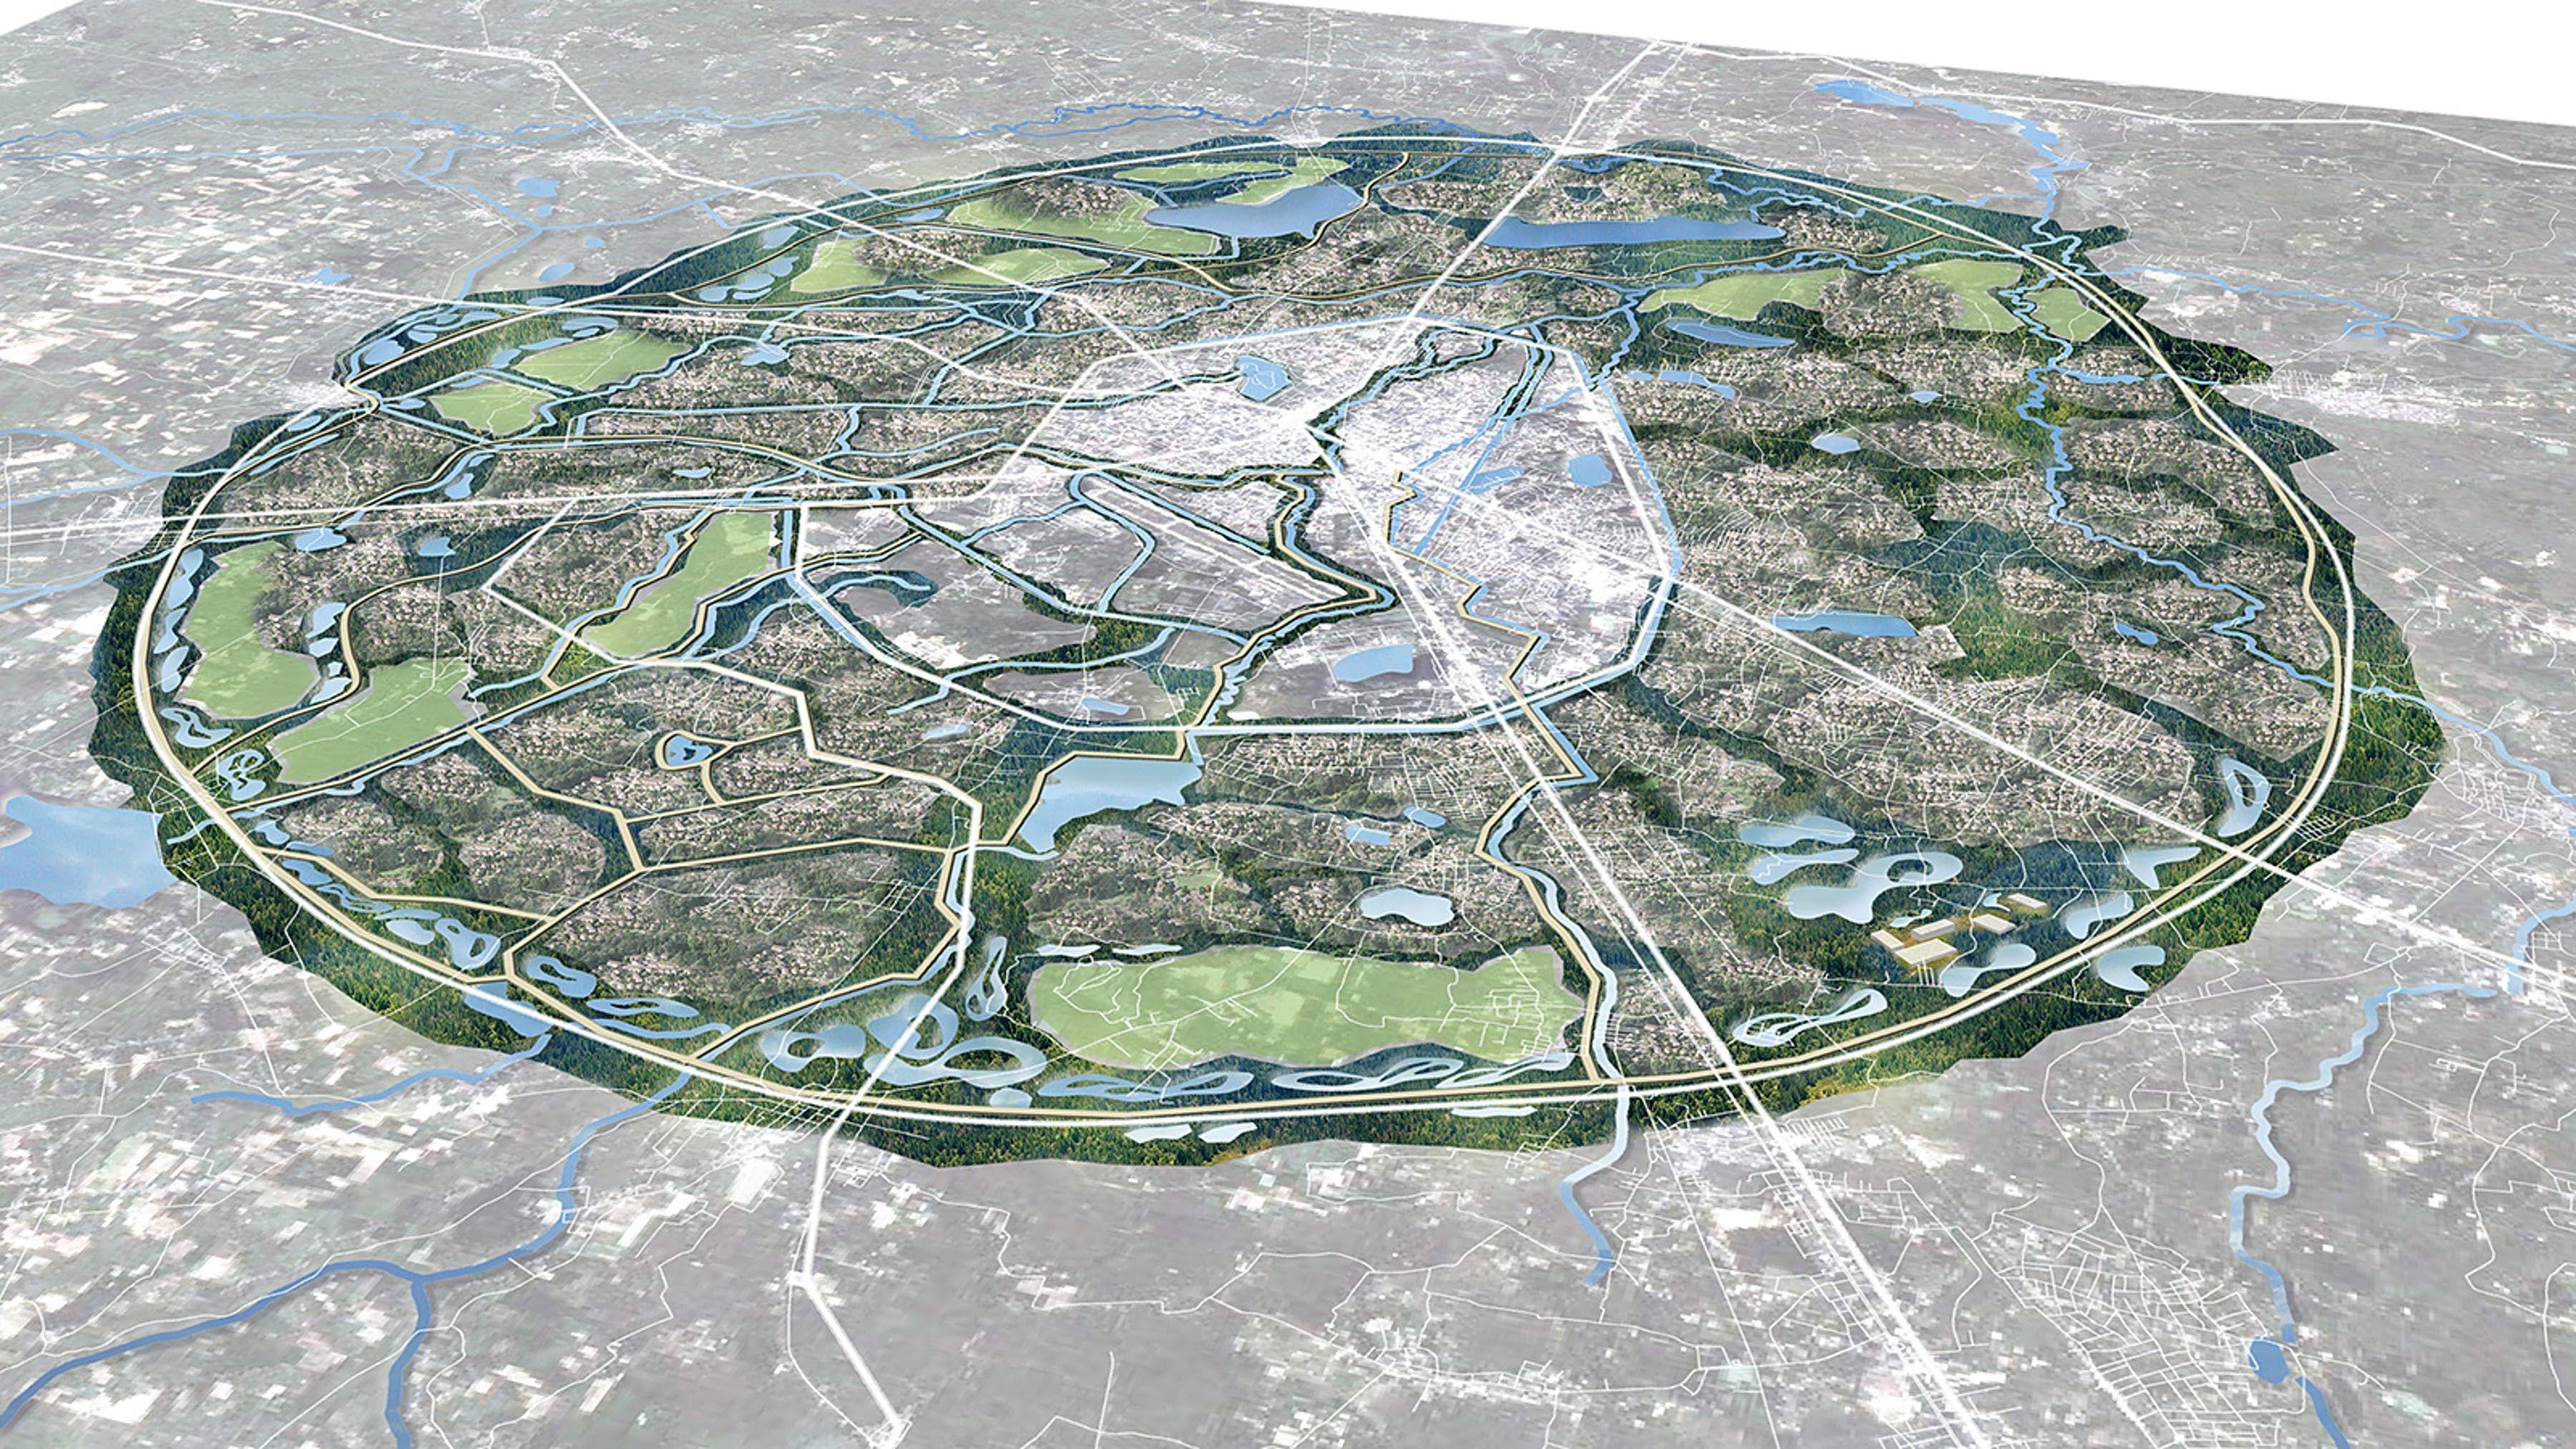 Estudiooca Wins Rockefeller Foundation Grant To Develop Green Infrastructure Master Plan In Northern Thailand In 2020 Sponge City City Master Plan